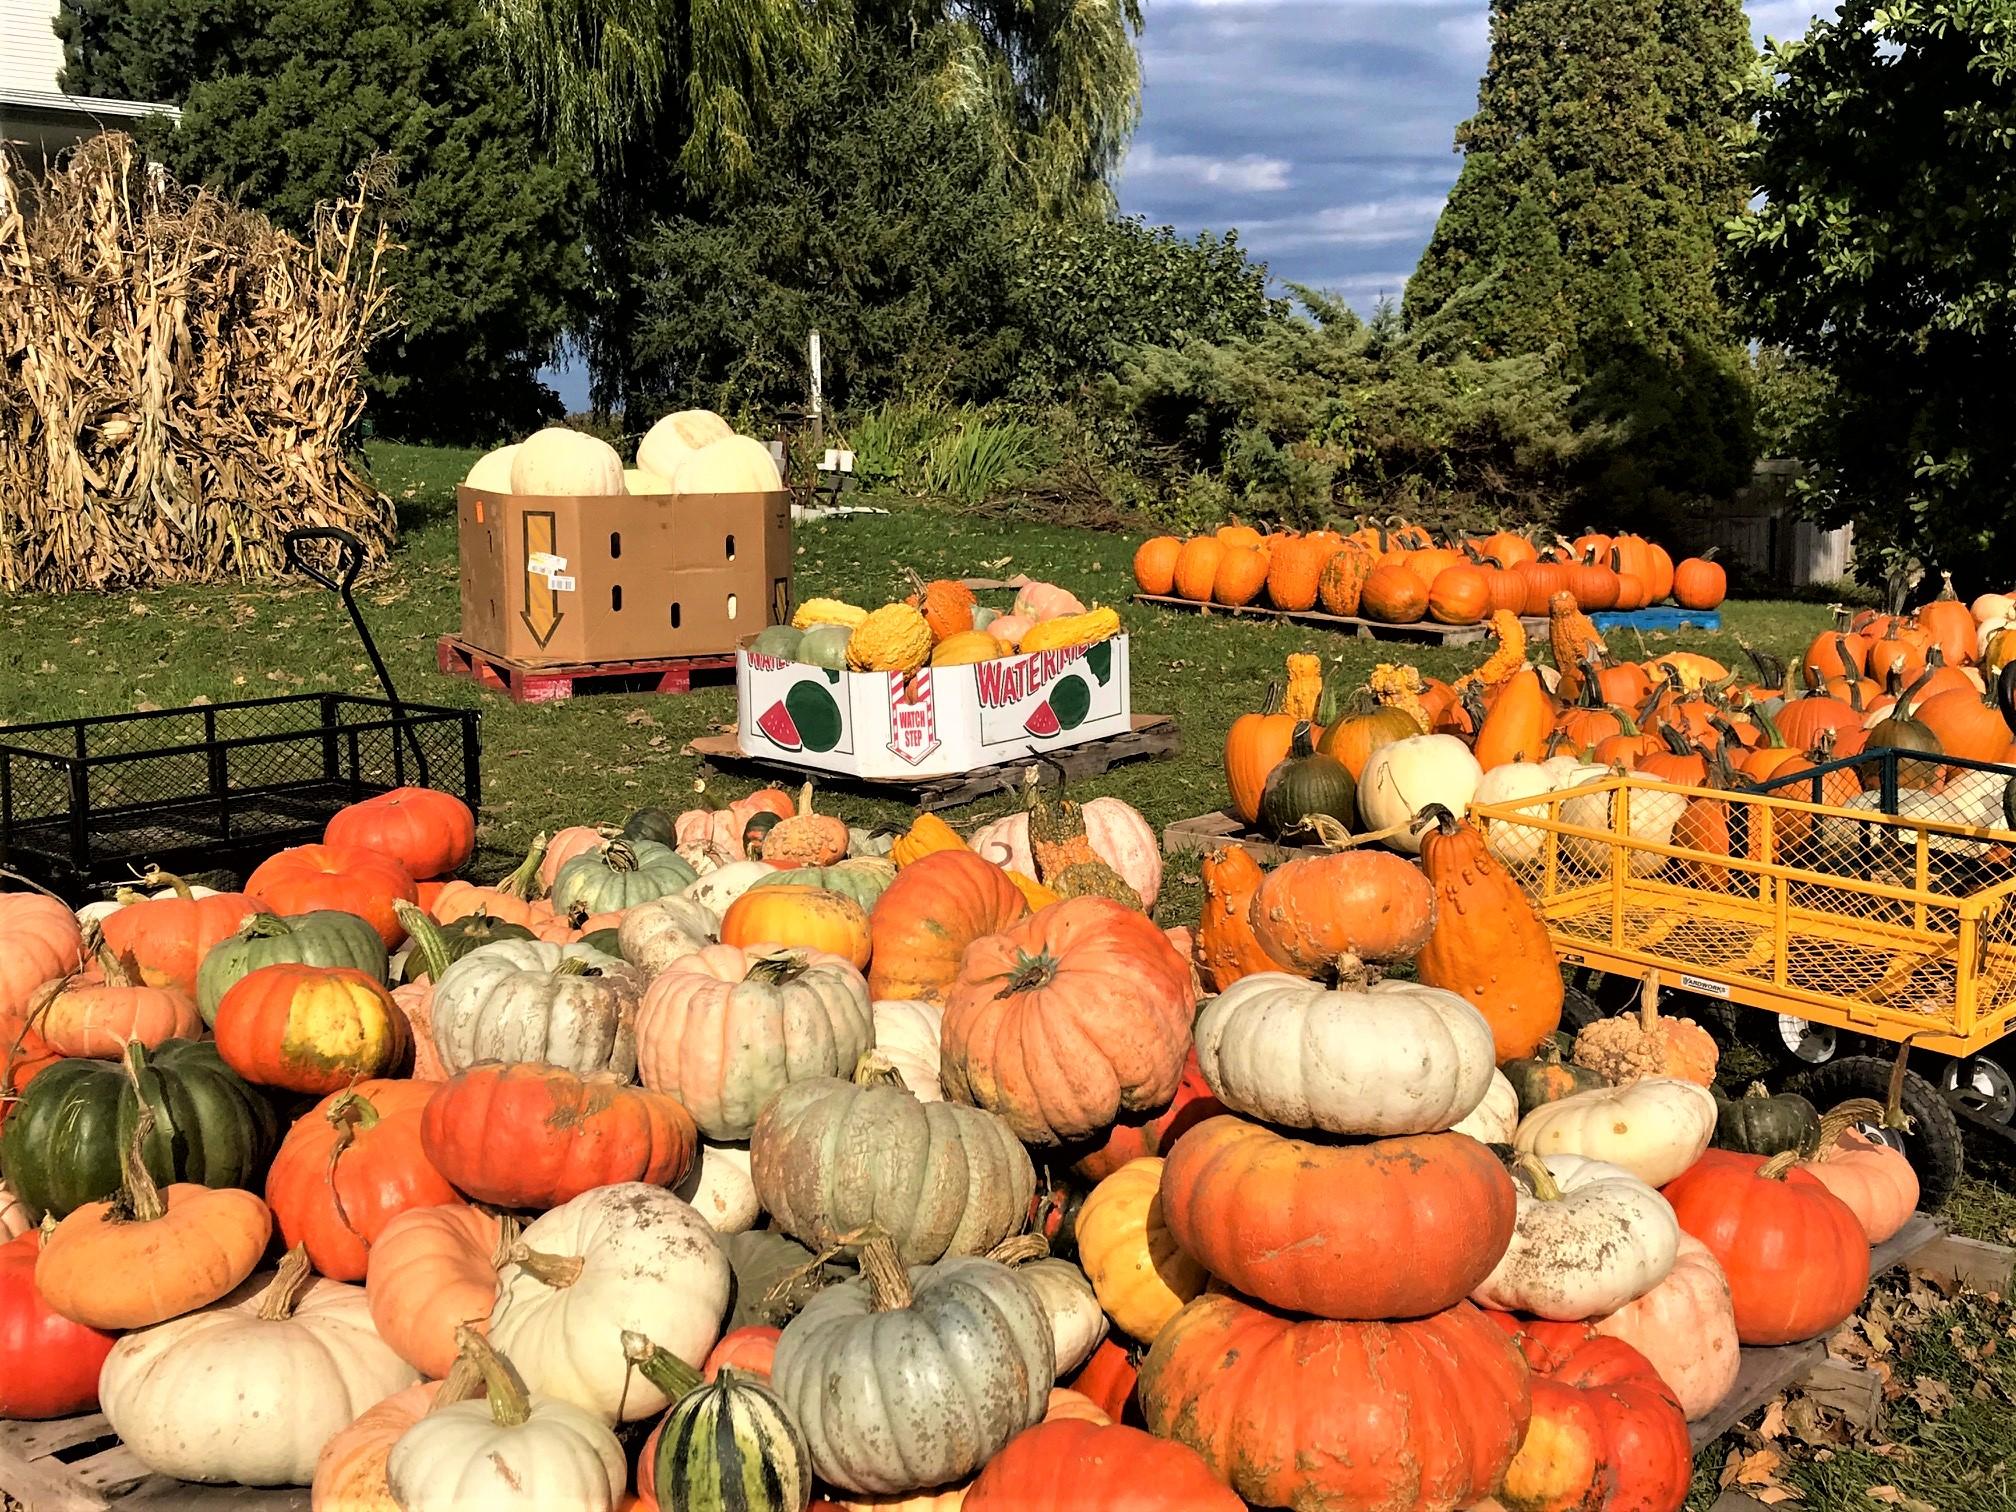 GABB Colorful Fall Pumpkins Galore 2020